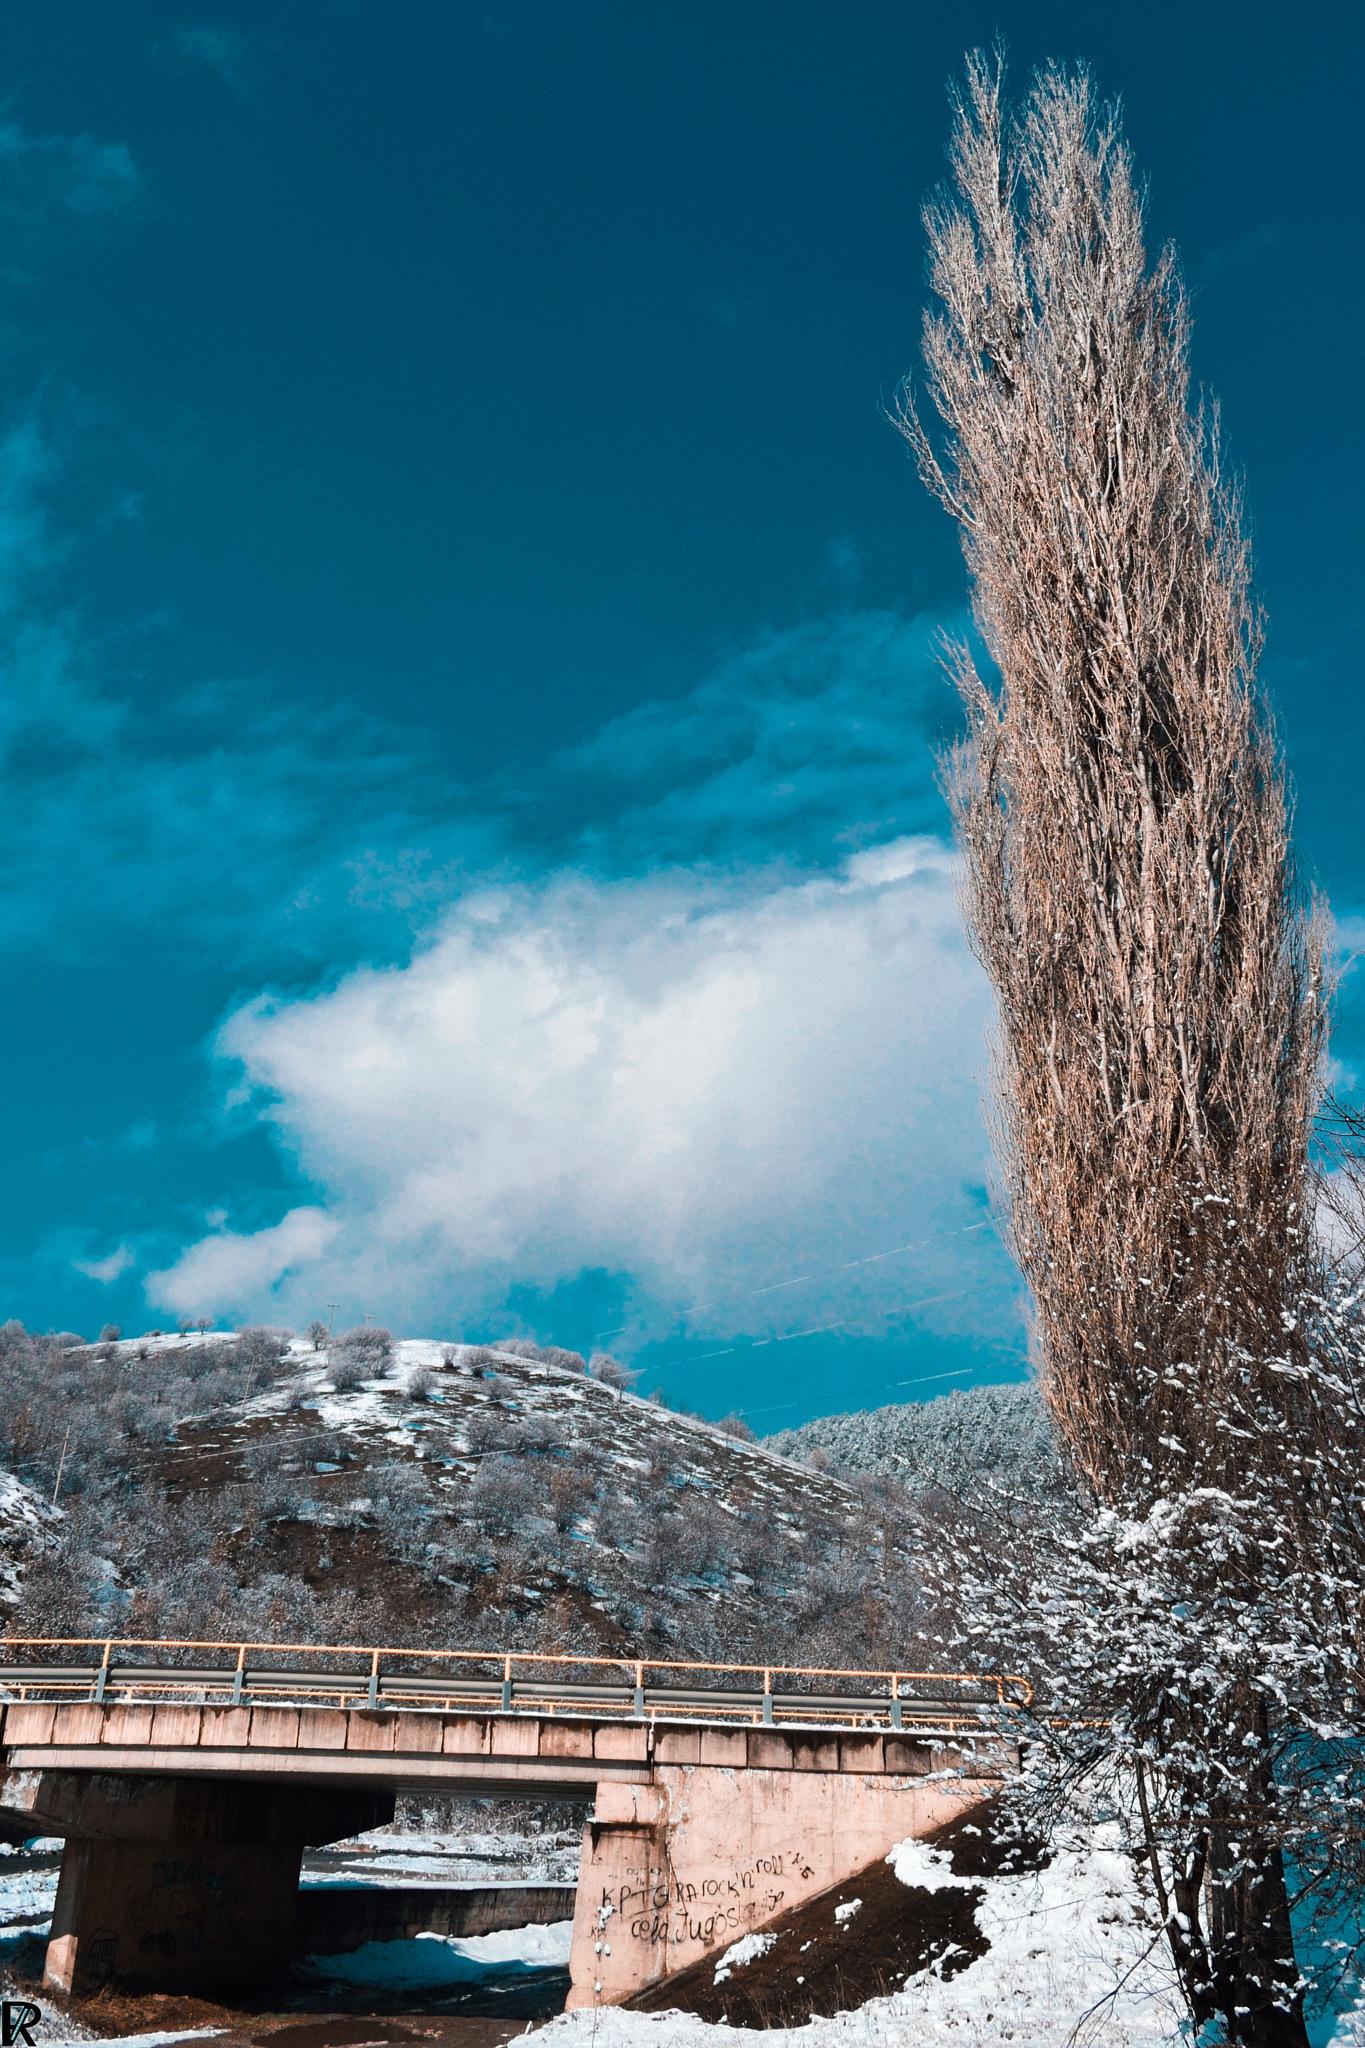 Winter in Kriva Palanka, Macedonia (7) by Robert Krstevski